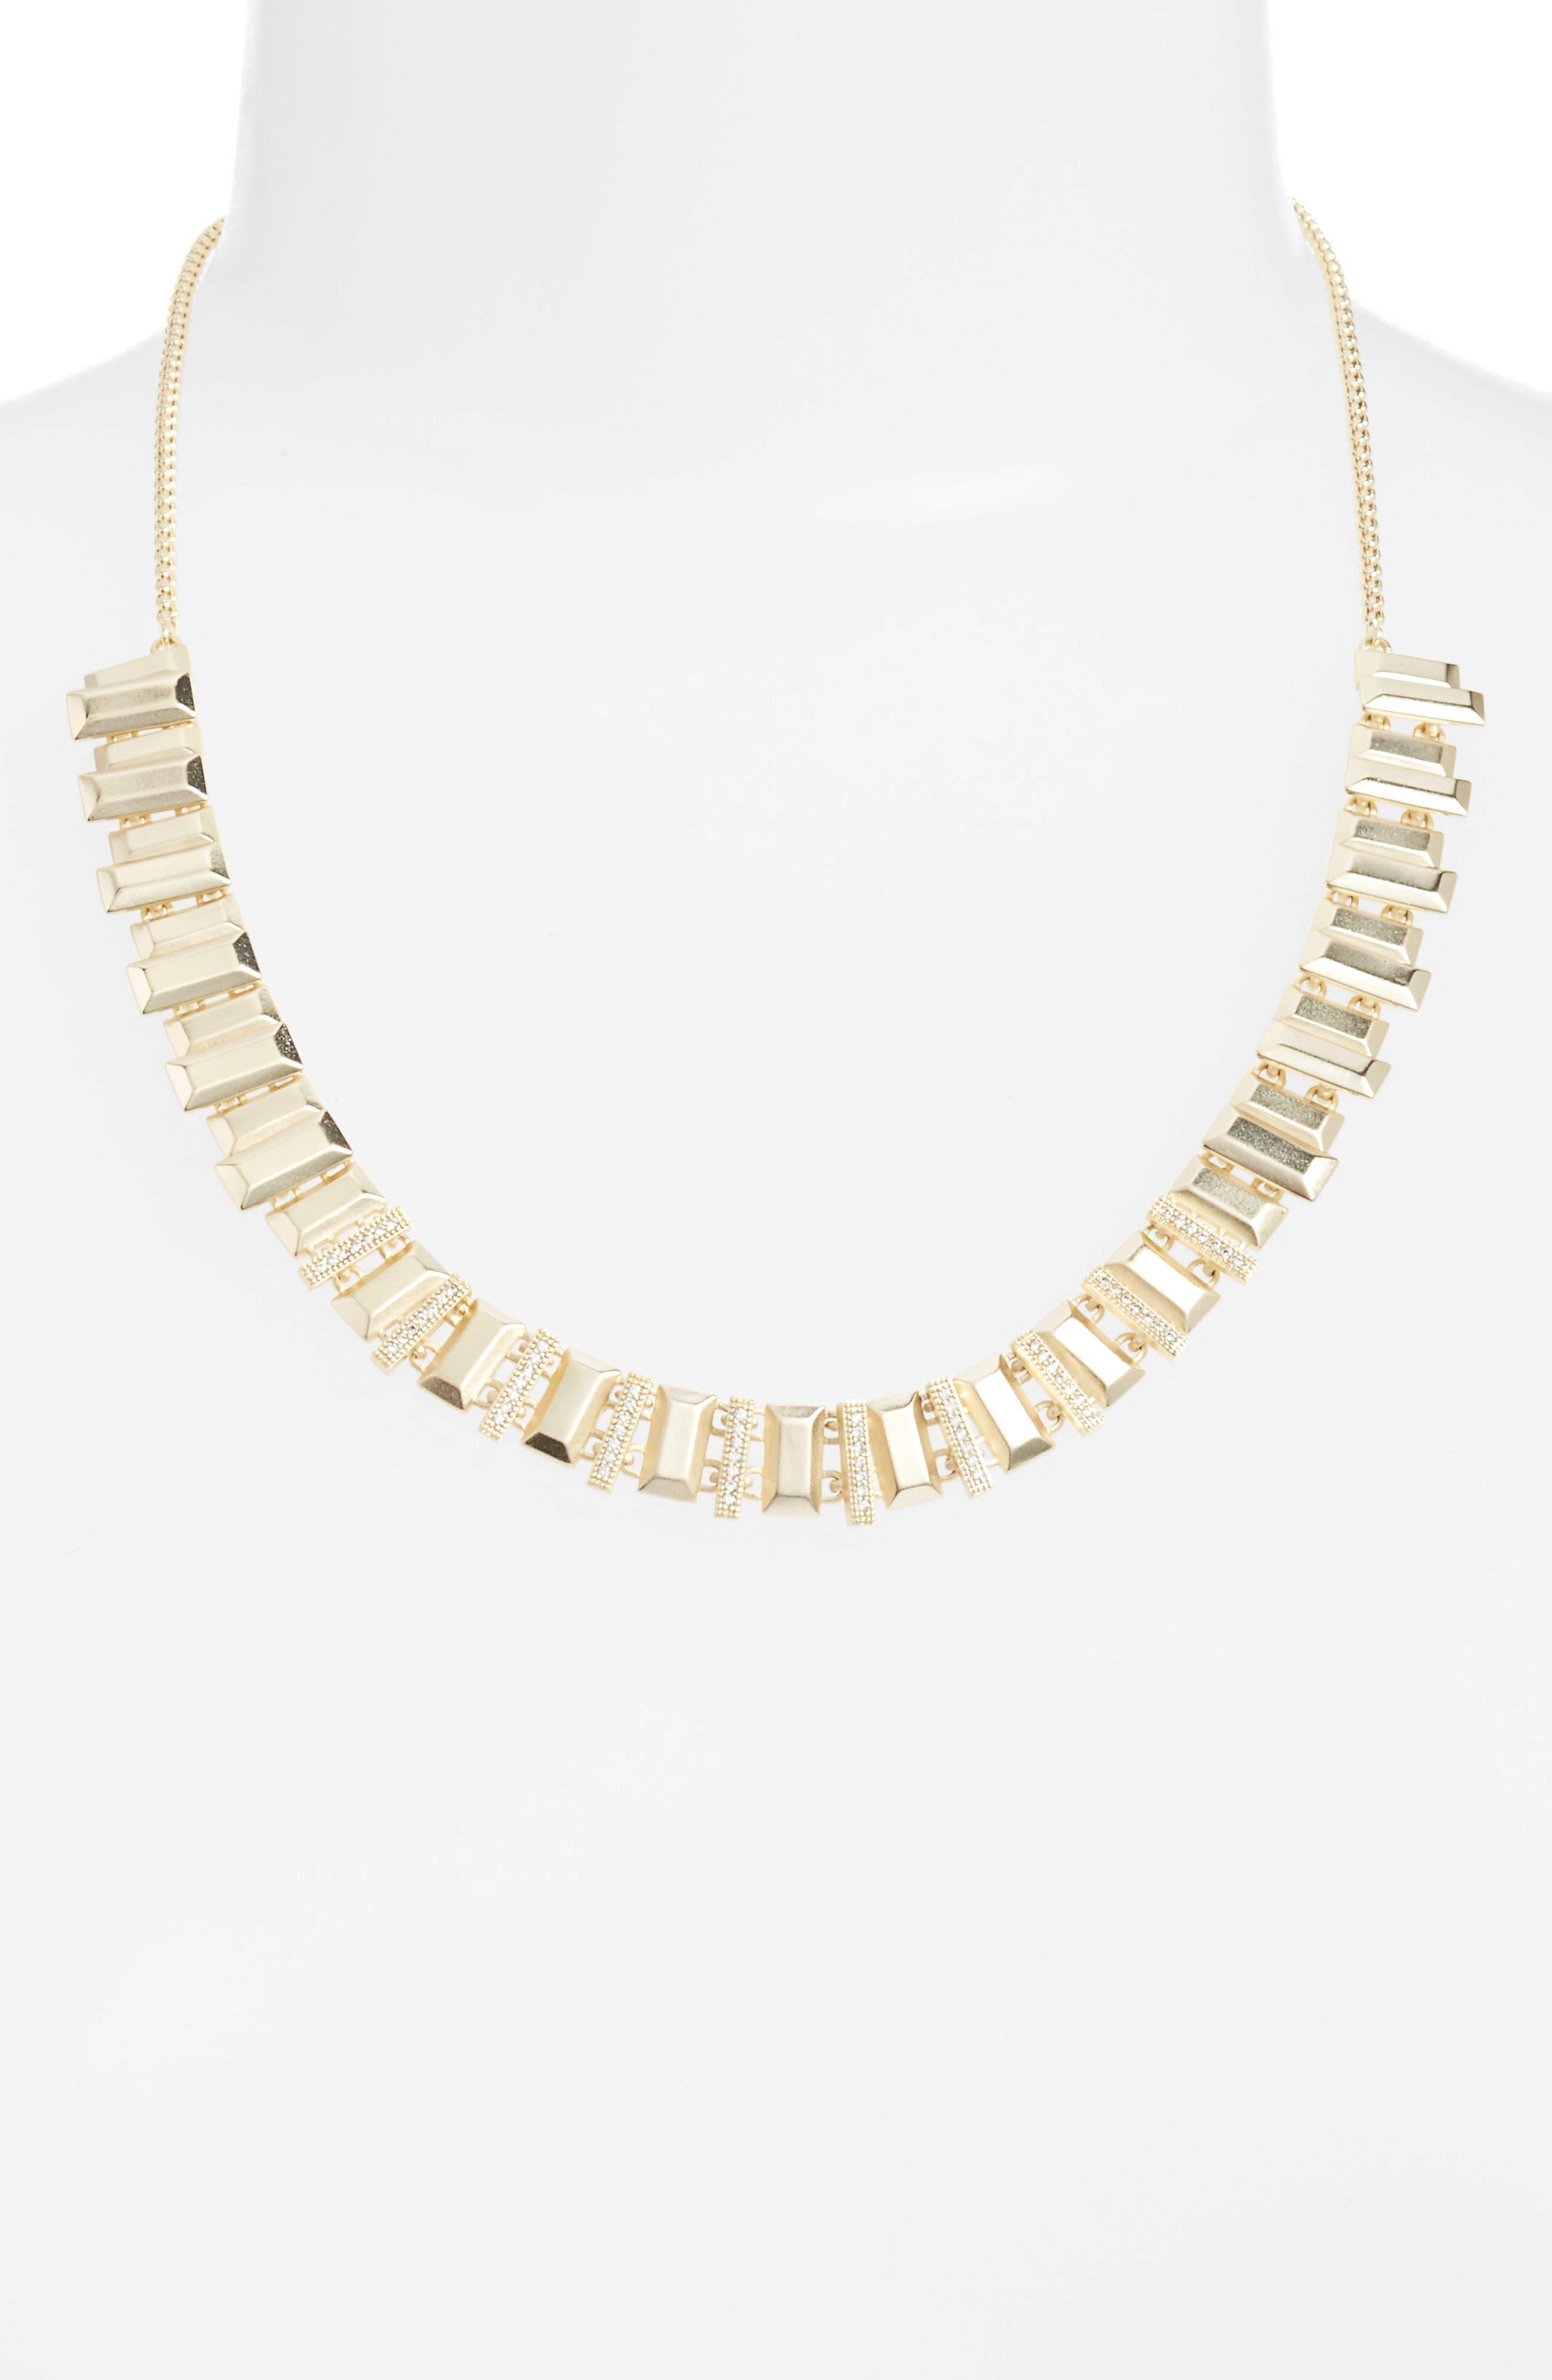 KENDRA SCOTT Harper Collar Necklace